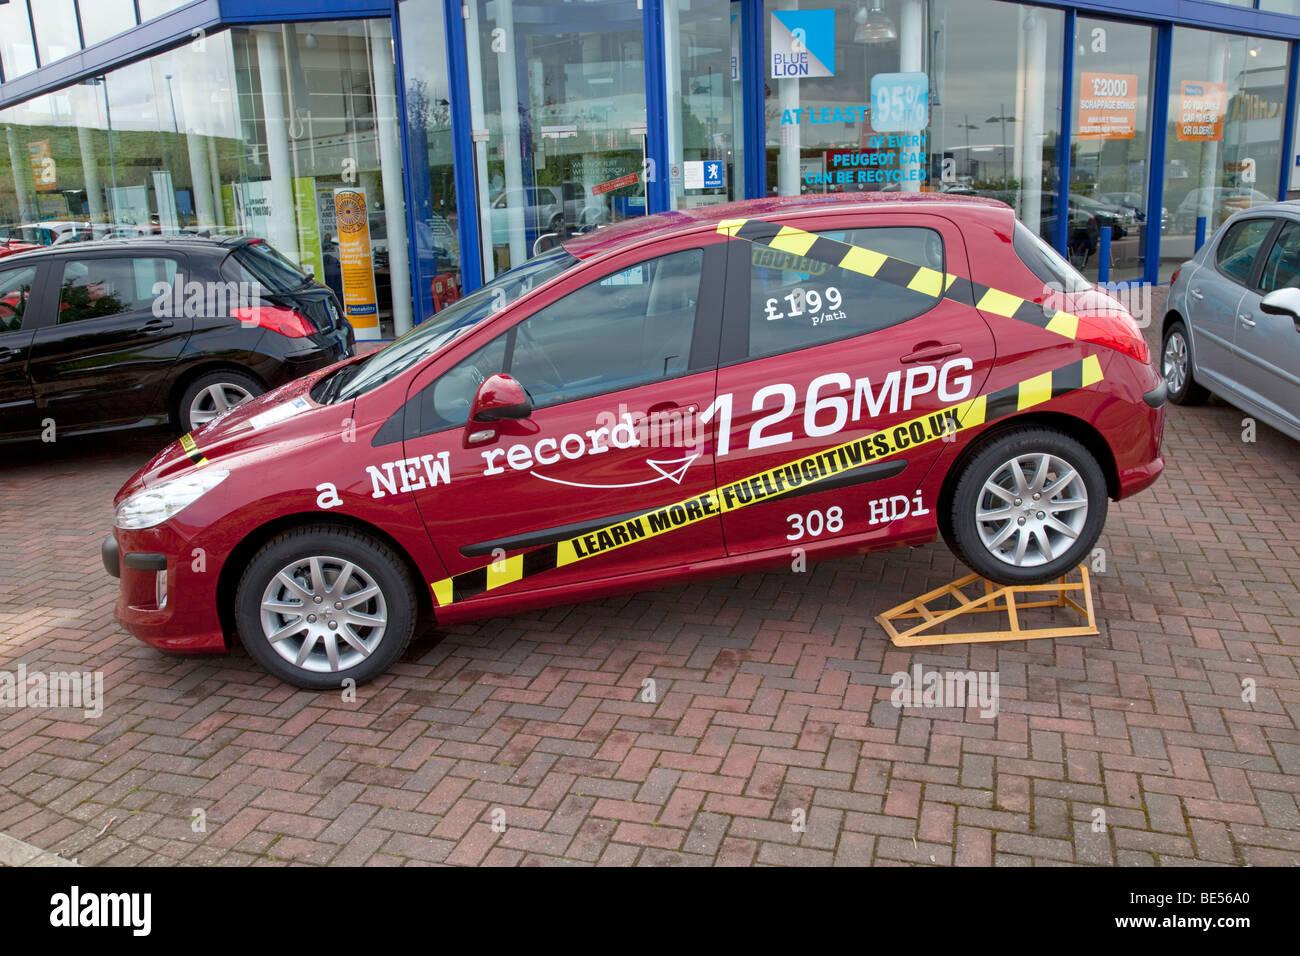 Peugeot 308 HDI new record 126 miles per gallon Bristol UK - Stock Image